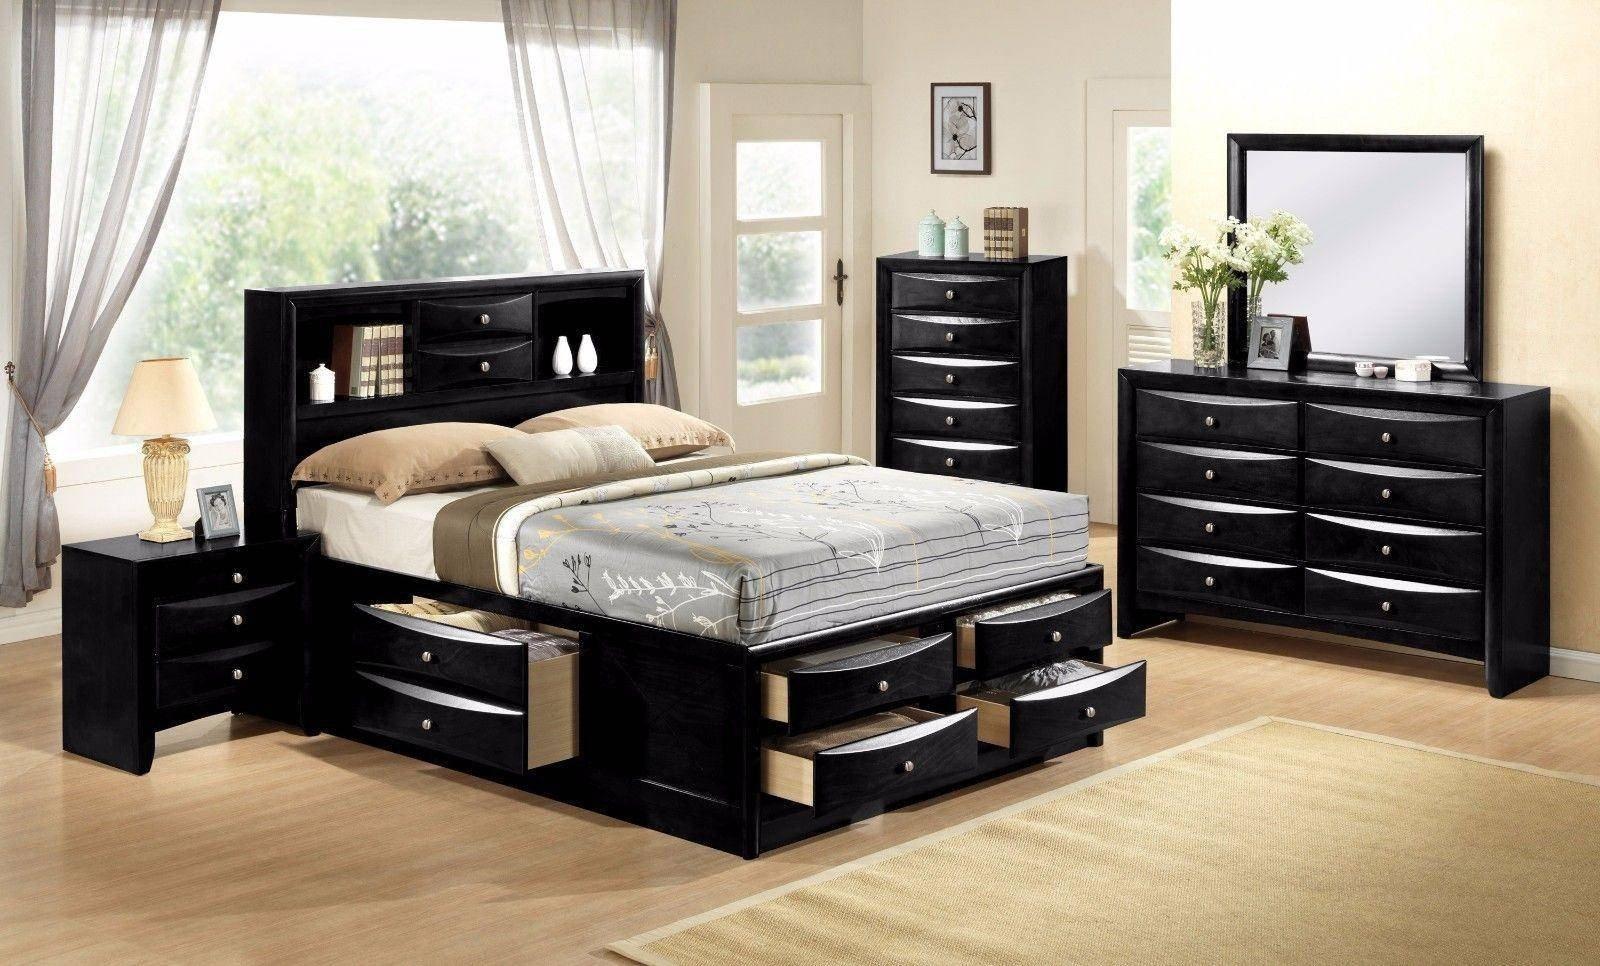 5 Piece Bedroom Set Inspirational Crown Mark B4285 Emily Modern Black Finish Storage King Size